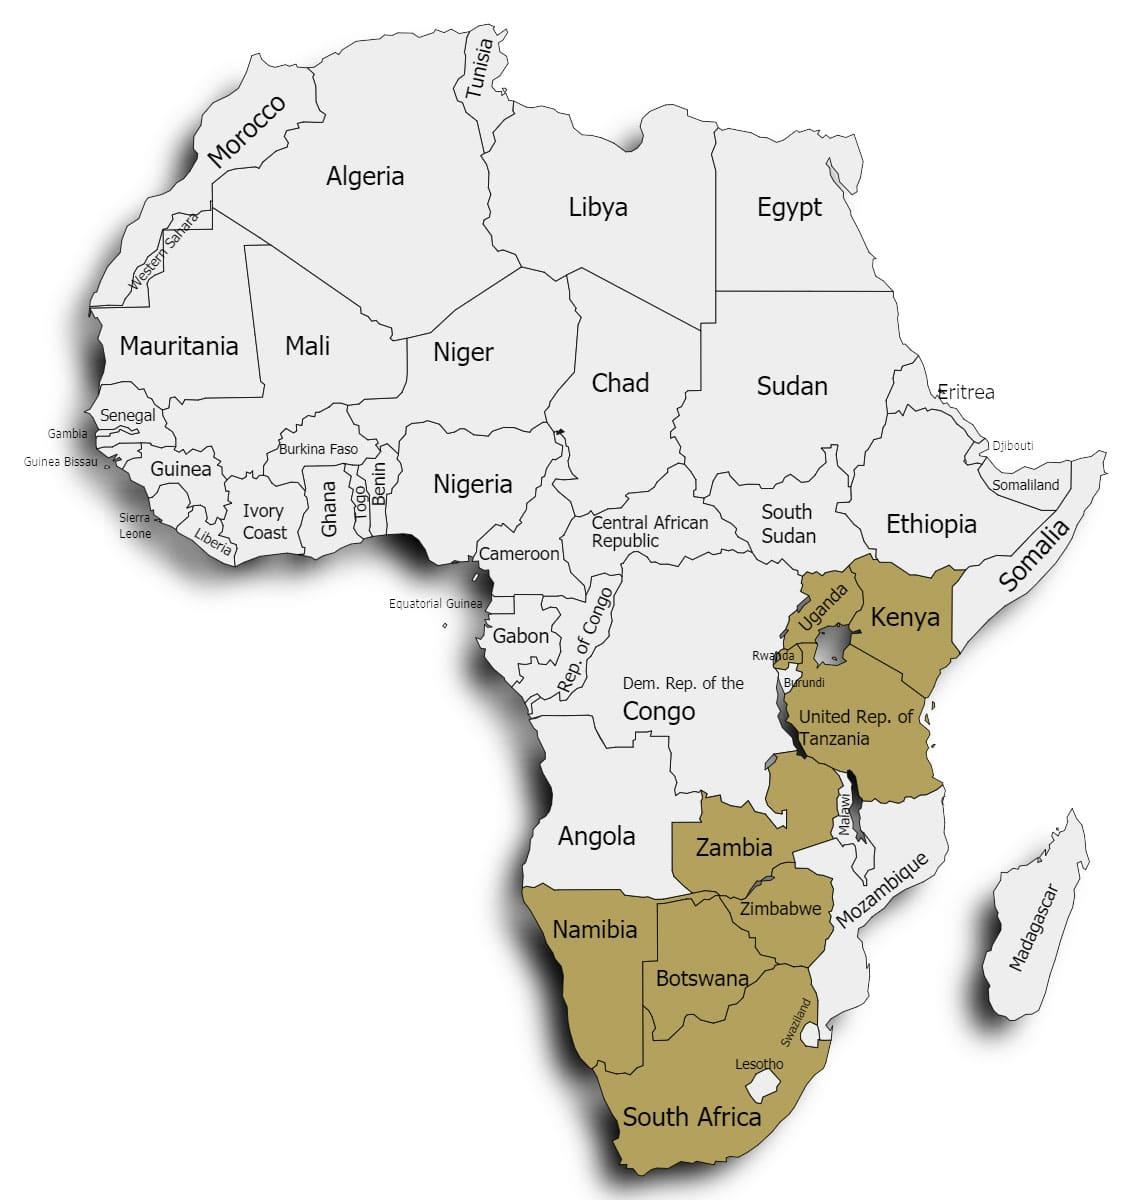 https://www.safariventures.com/wp-content/uploads/Africa-Map.jpg